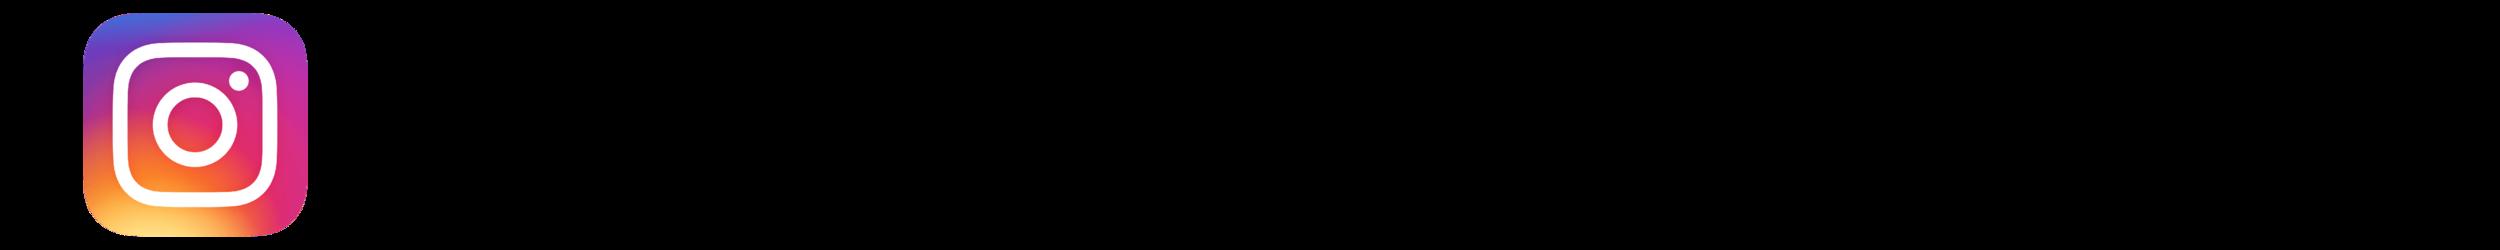 580b57fcd9996e24bc43c521.png